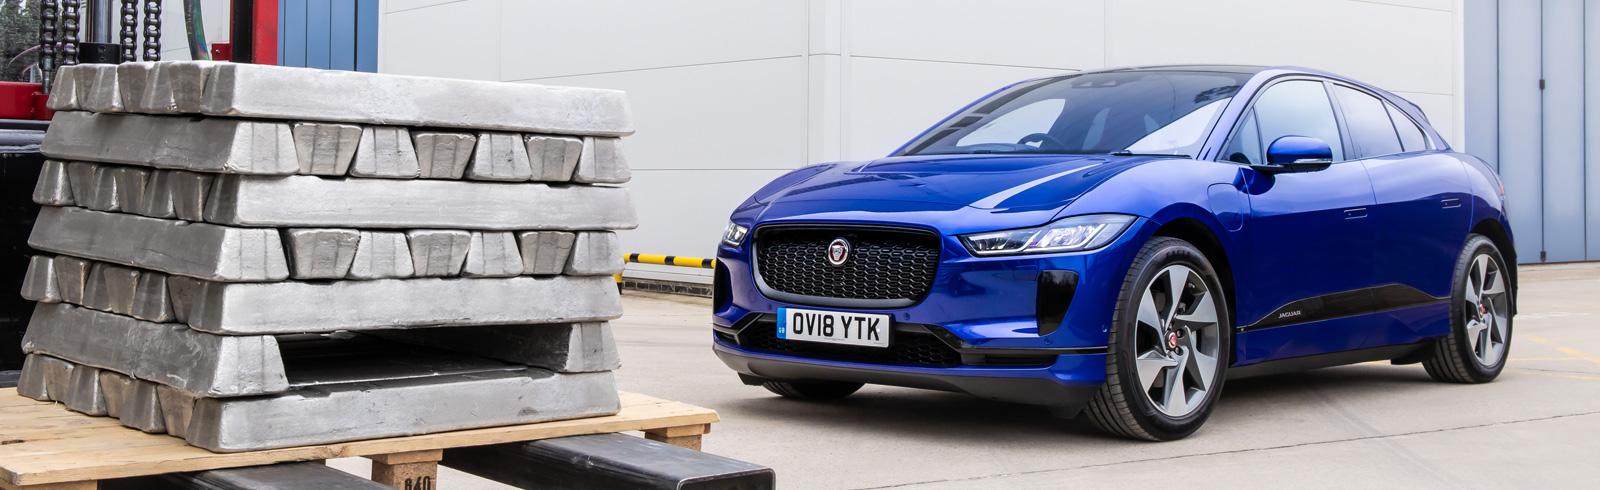 Jaguar Land Rover gives aluminium a second life